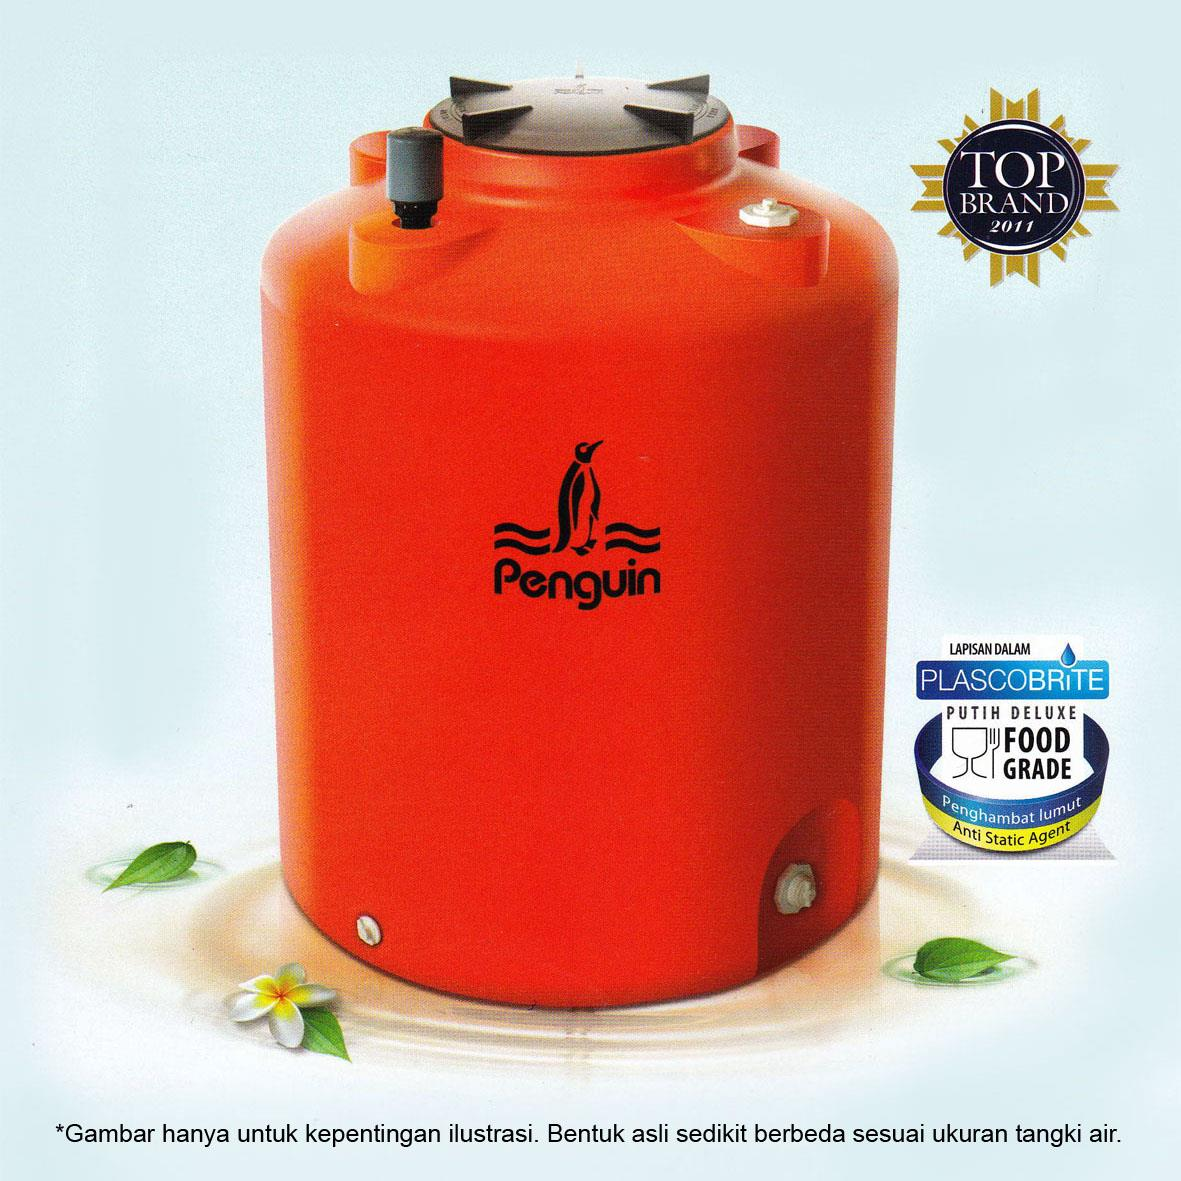 Jual Tangki Air Penguin 1100L Harga Murah Medan oleh Royal ...